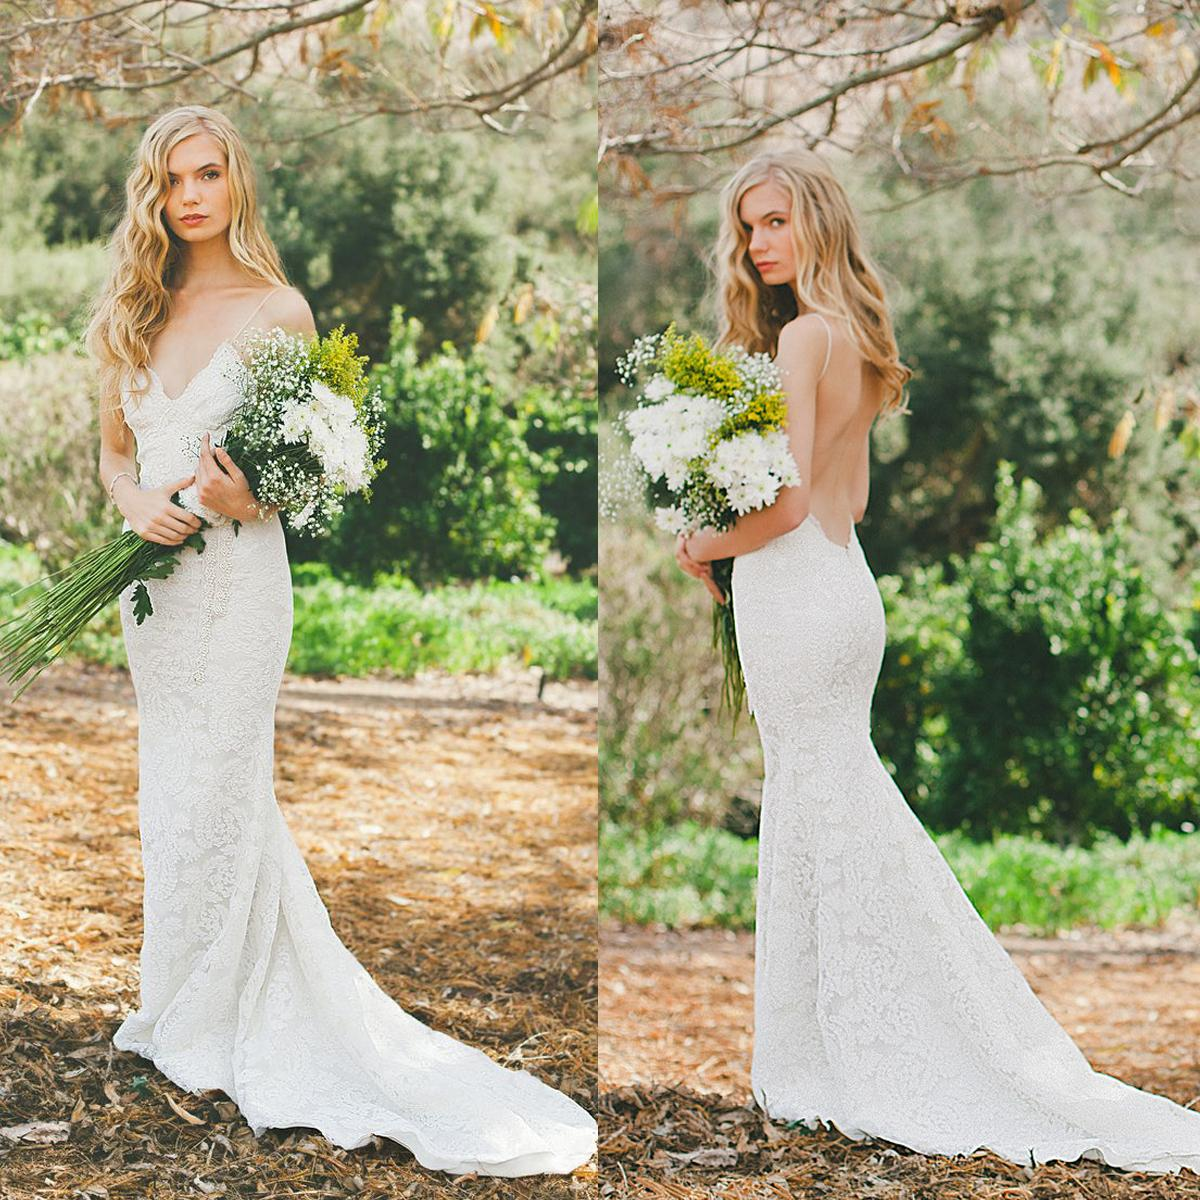 low back spaghetti strap wedding dress low back wedding dress low back spaghetti strap wedding dress